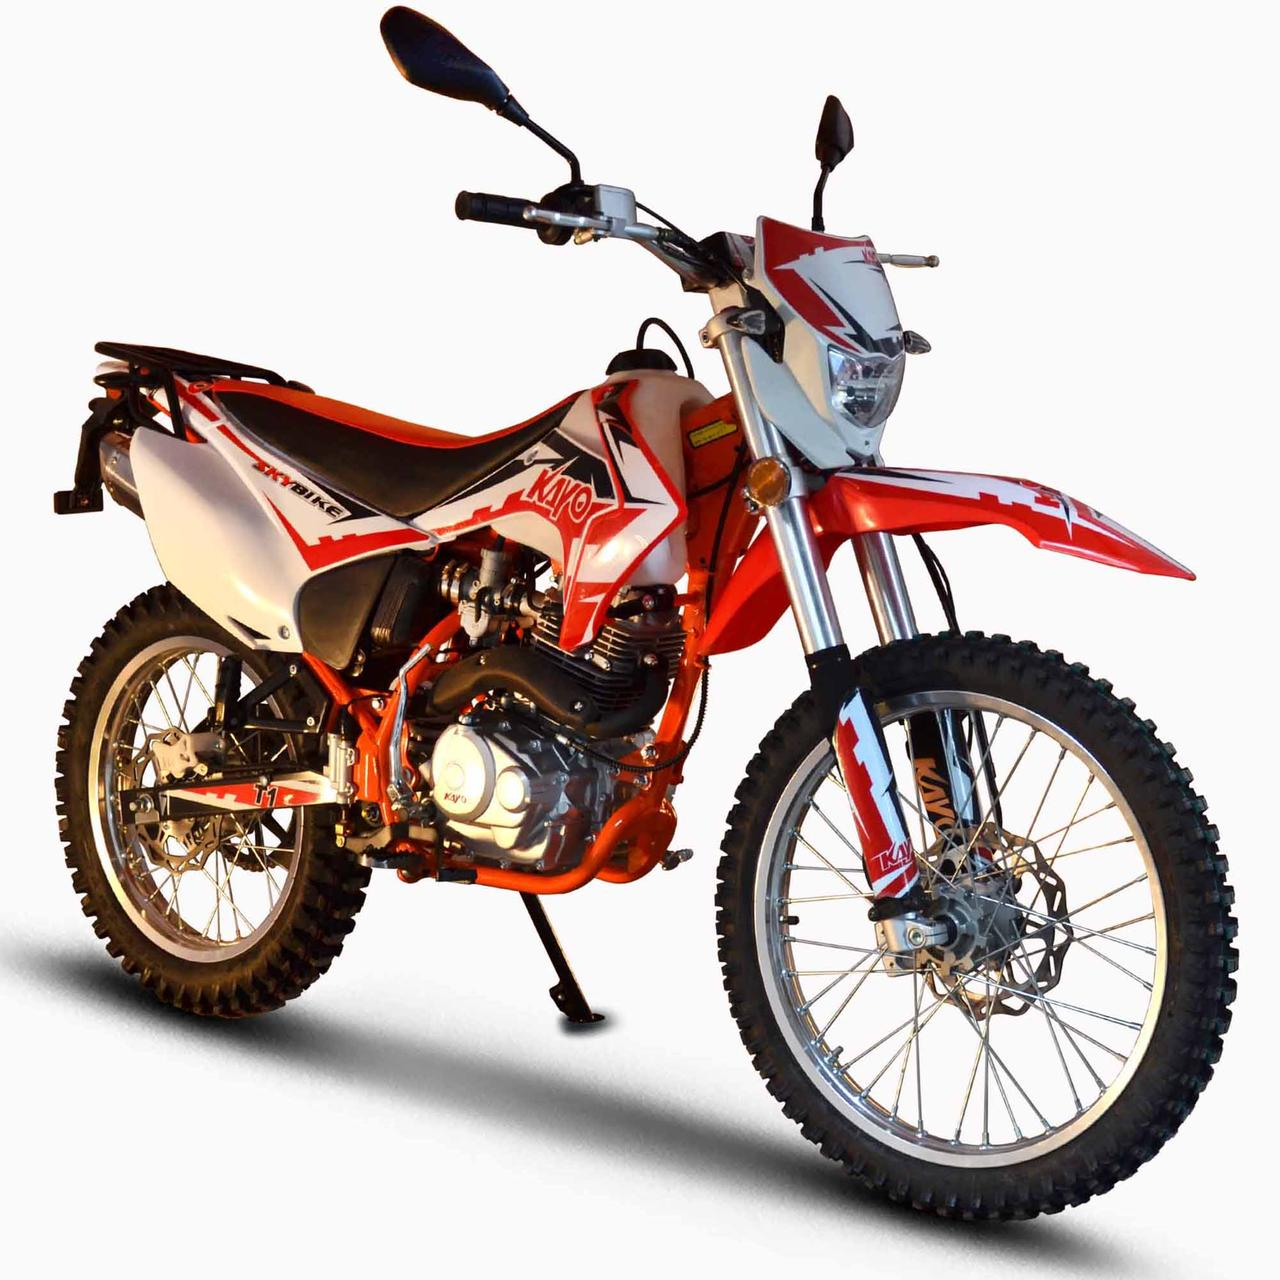 Мотоцикл Skybike KAYO T1-250 Бело-красный